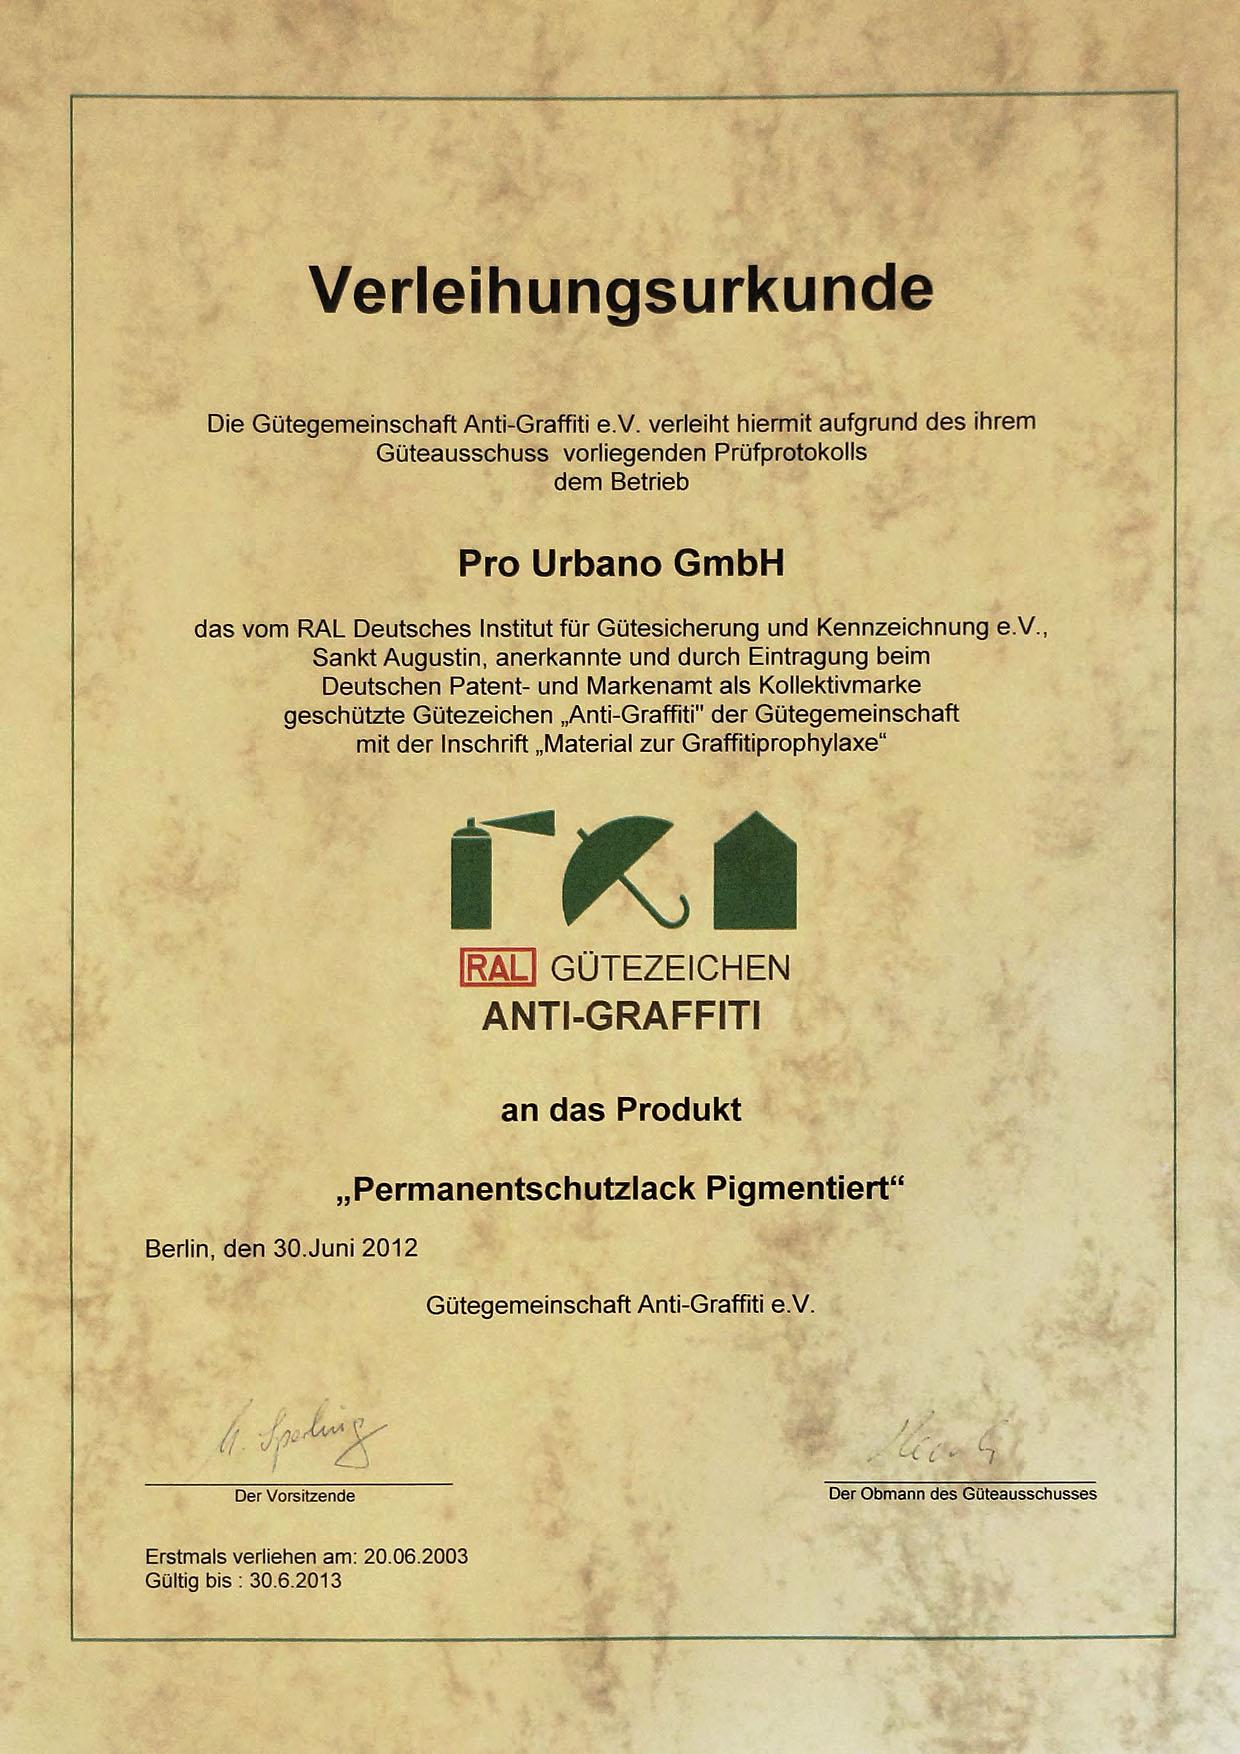 Urkunde_Perma_Pigmentiert_2012